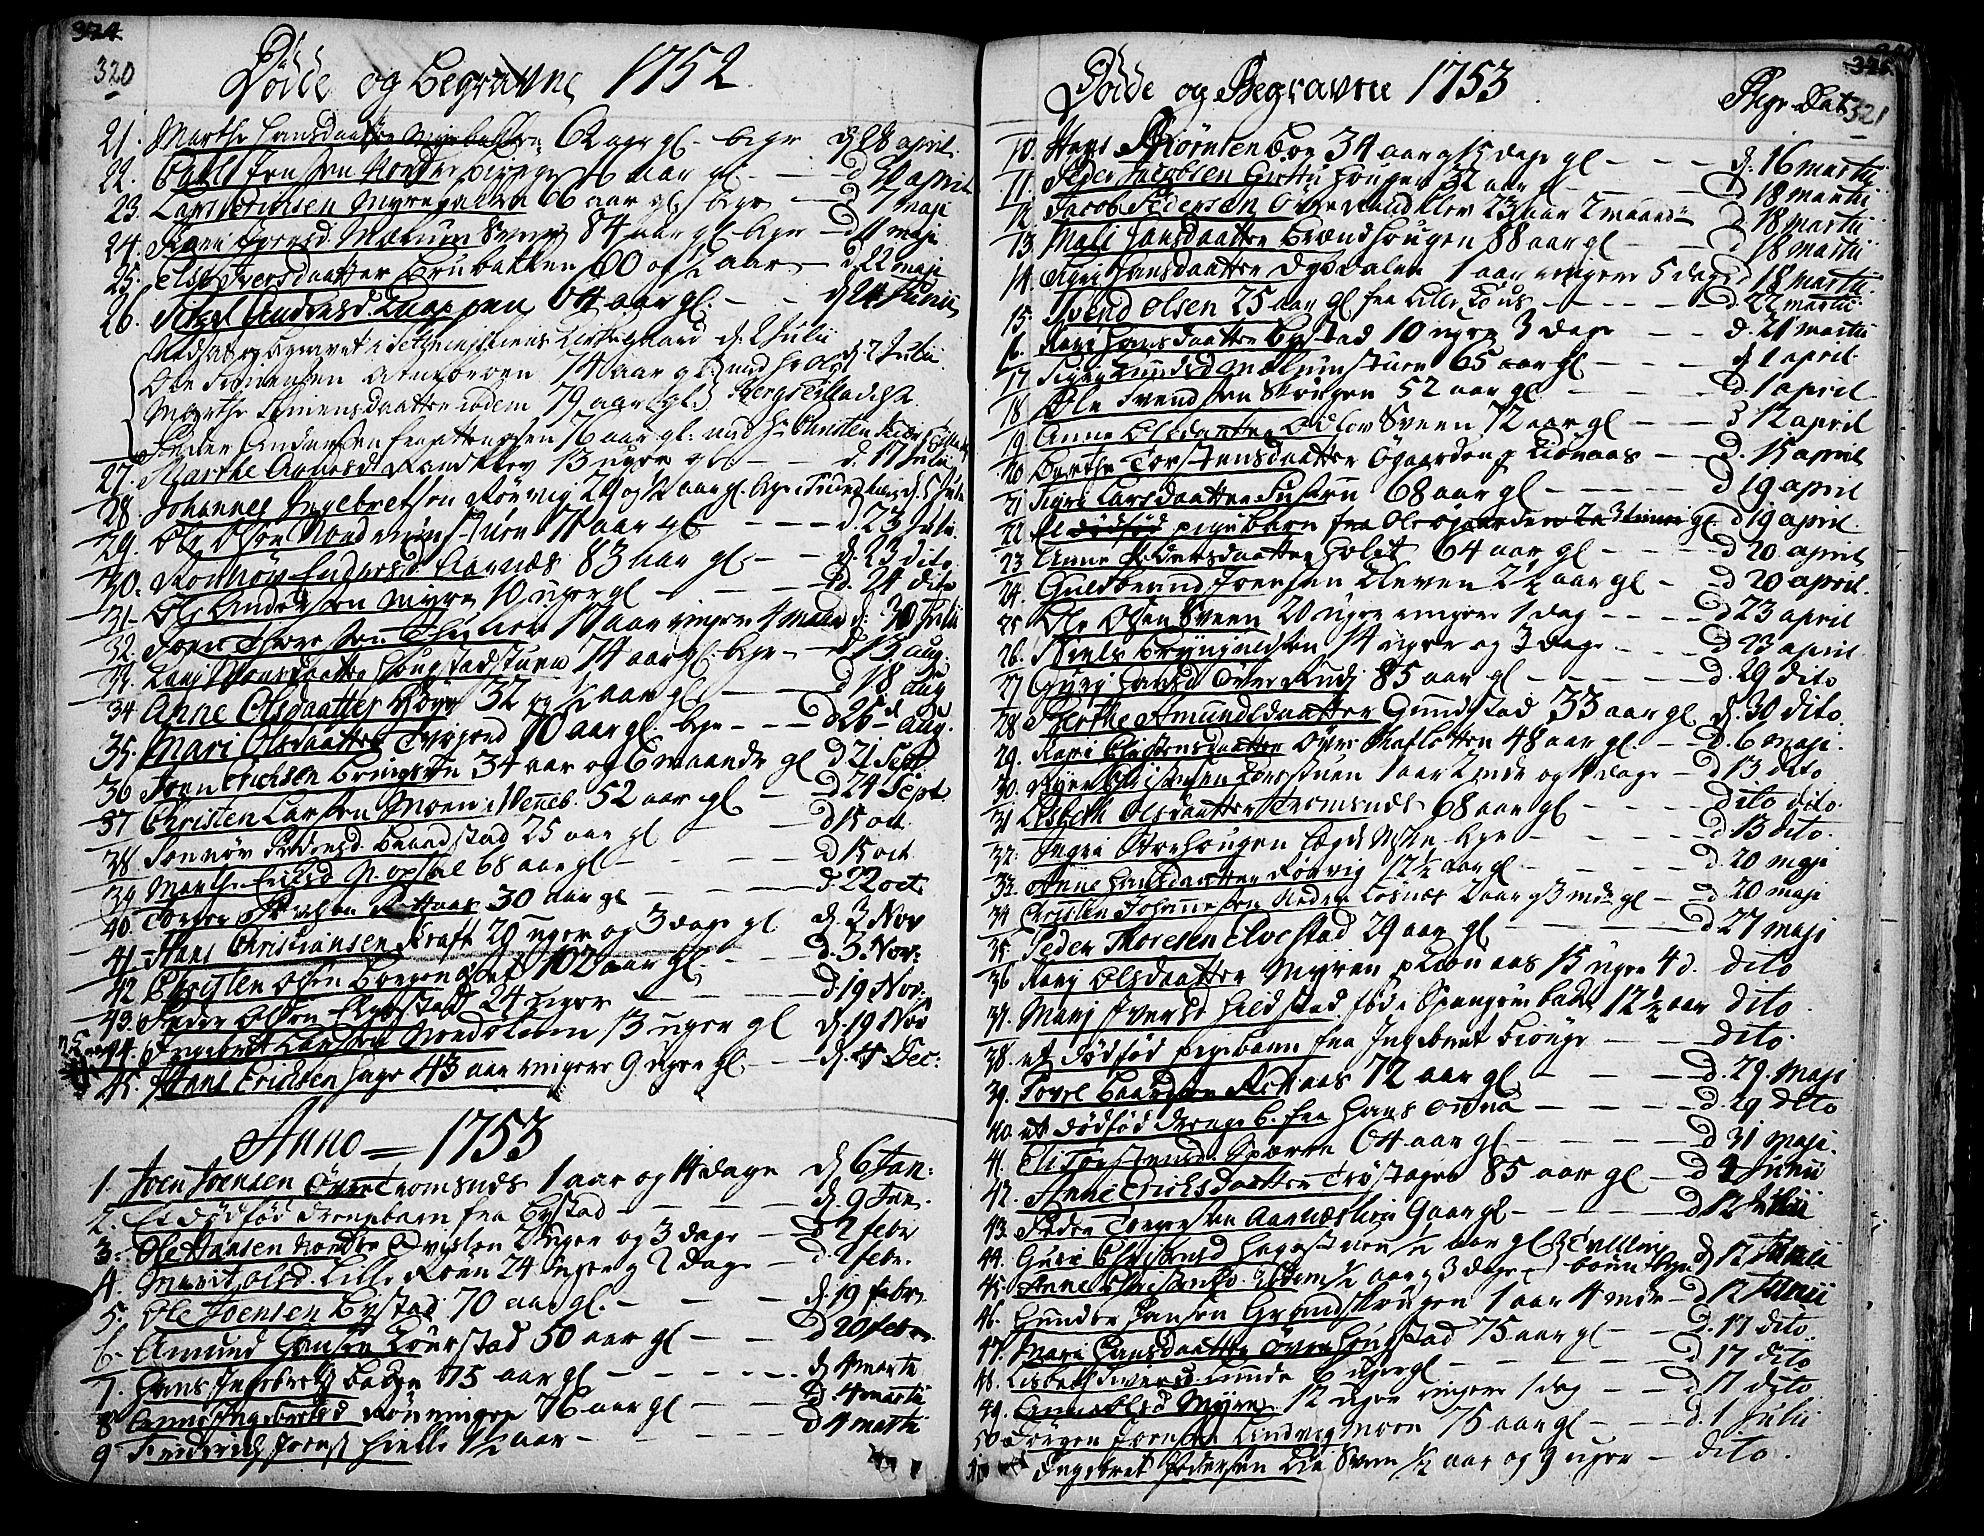 SAH, Ringebu prestekontor, Ministerialbok nr. 2, 1734-1780, s. 320-321